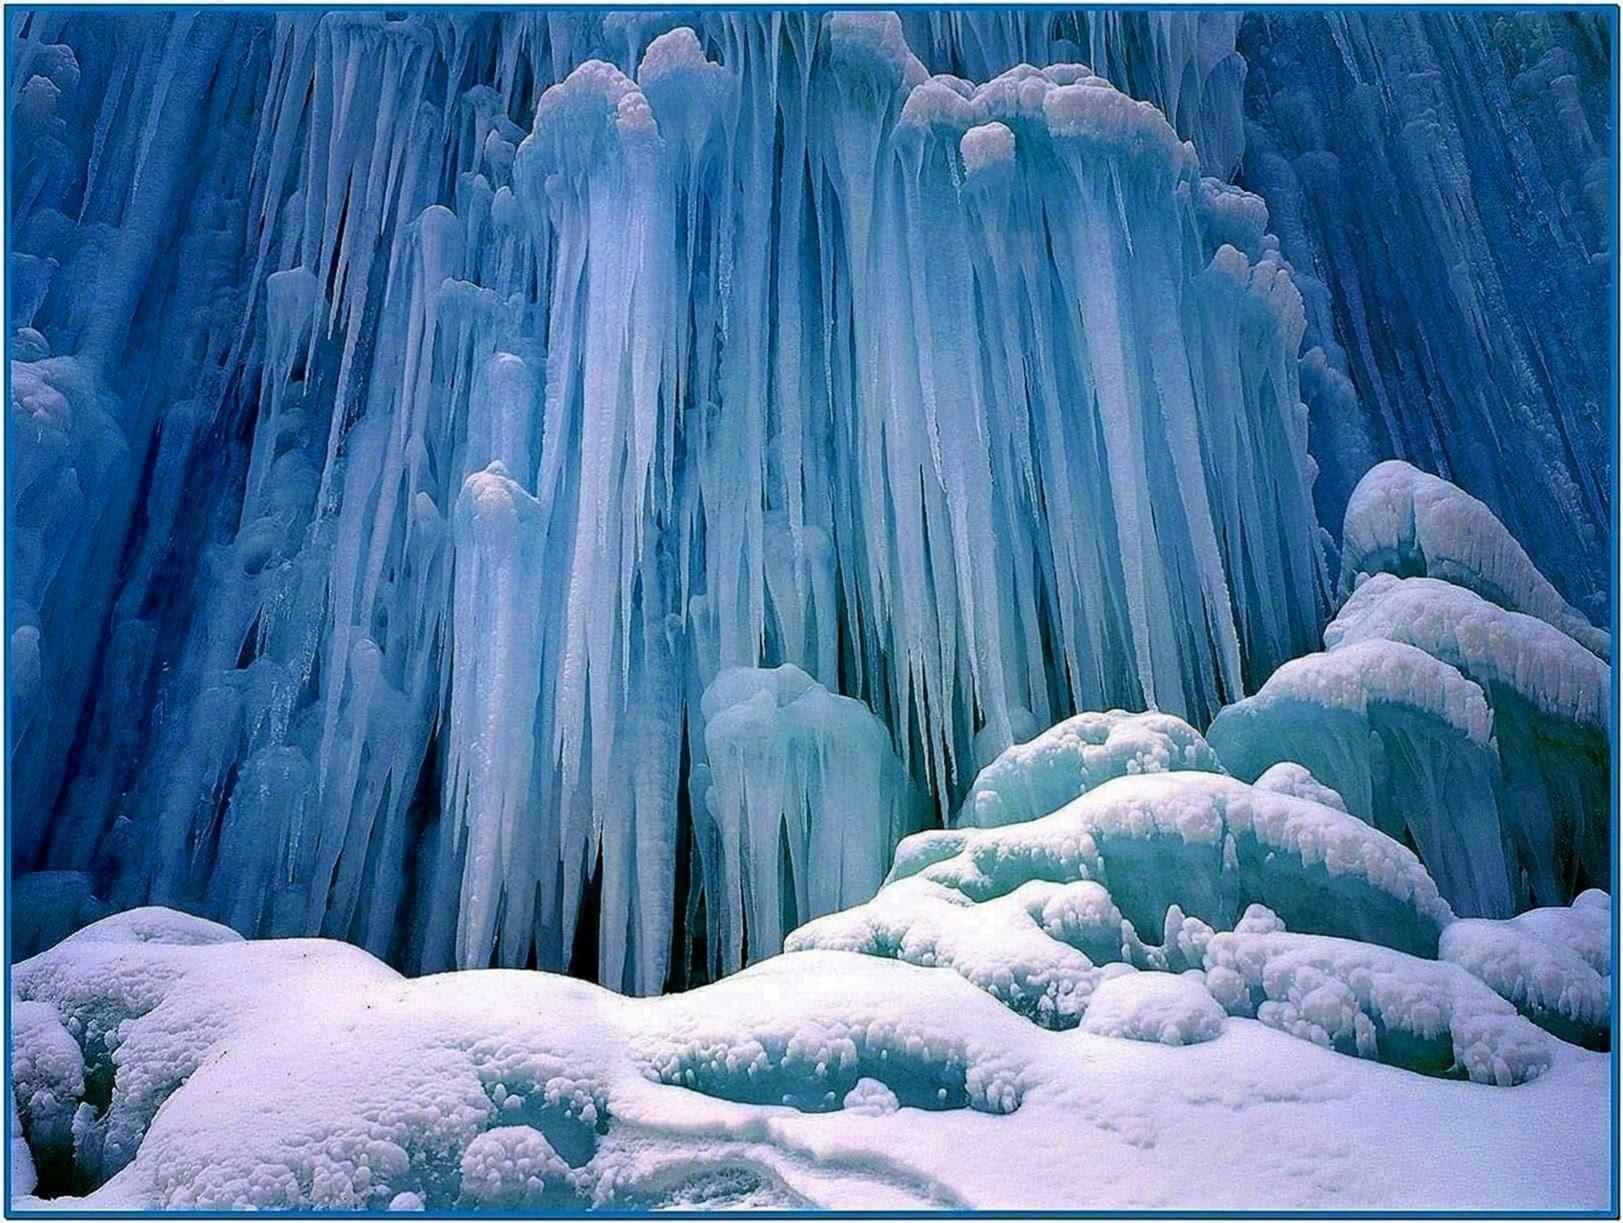 Snowy winter screensaver mac - Download free